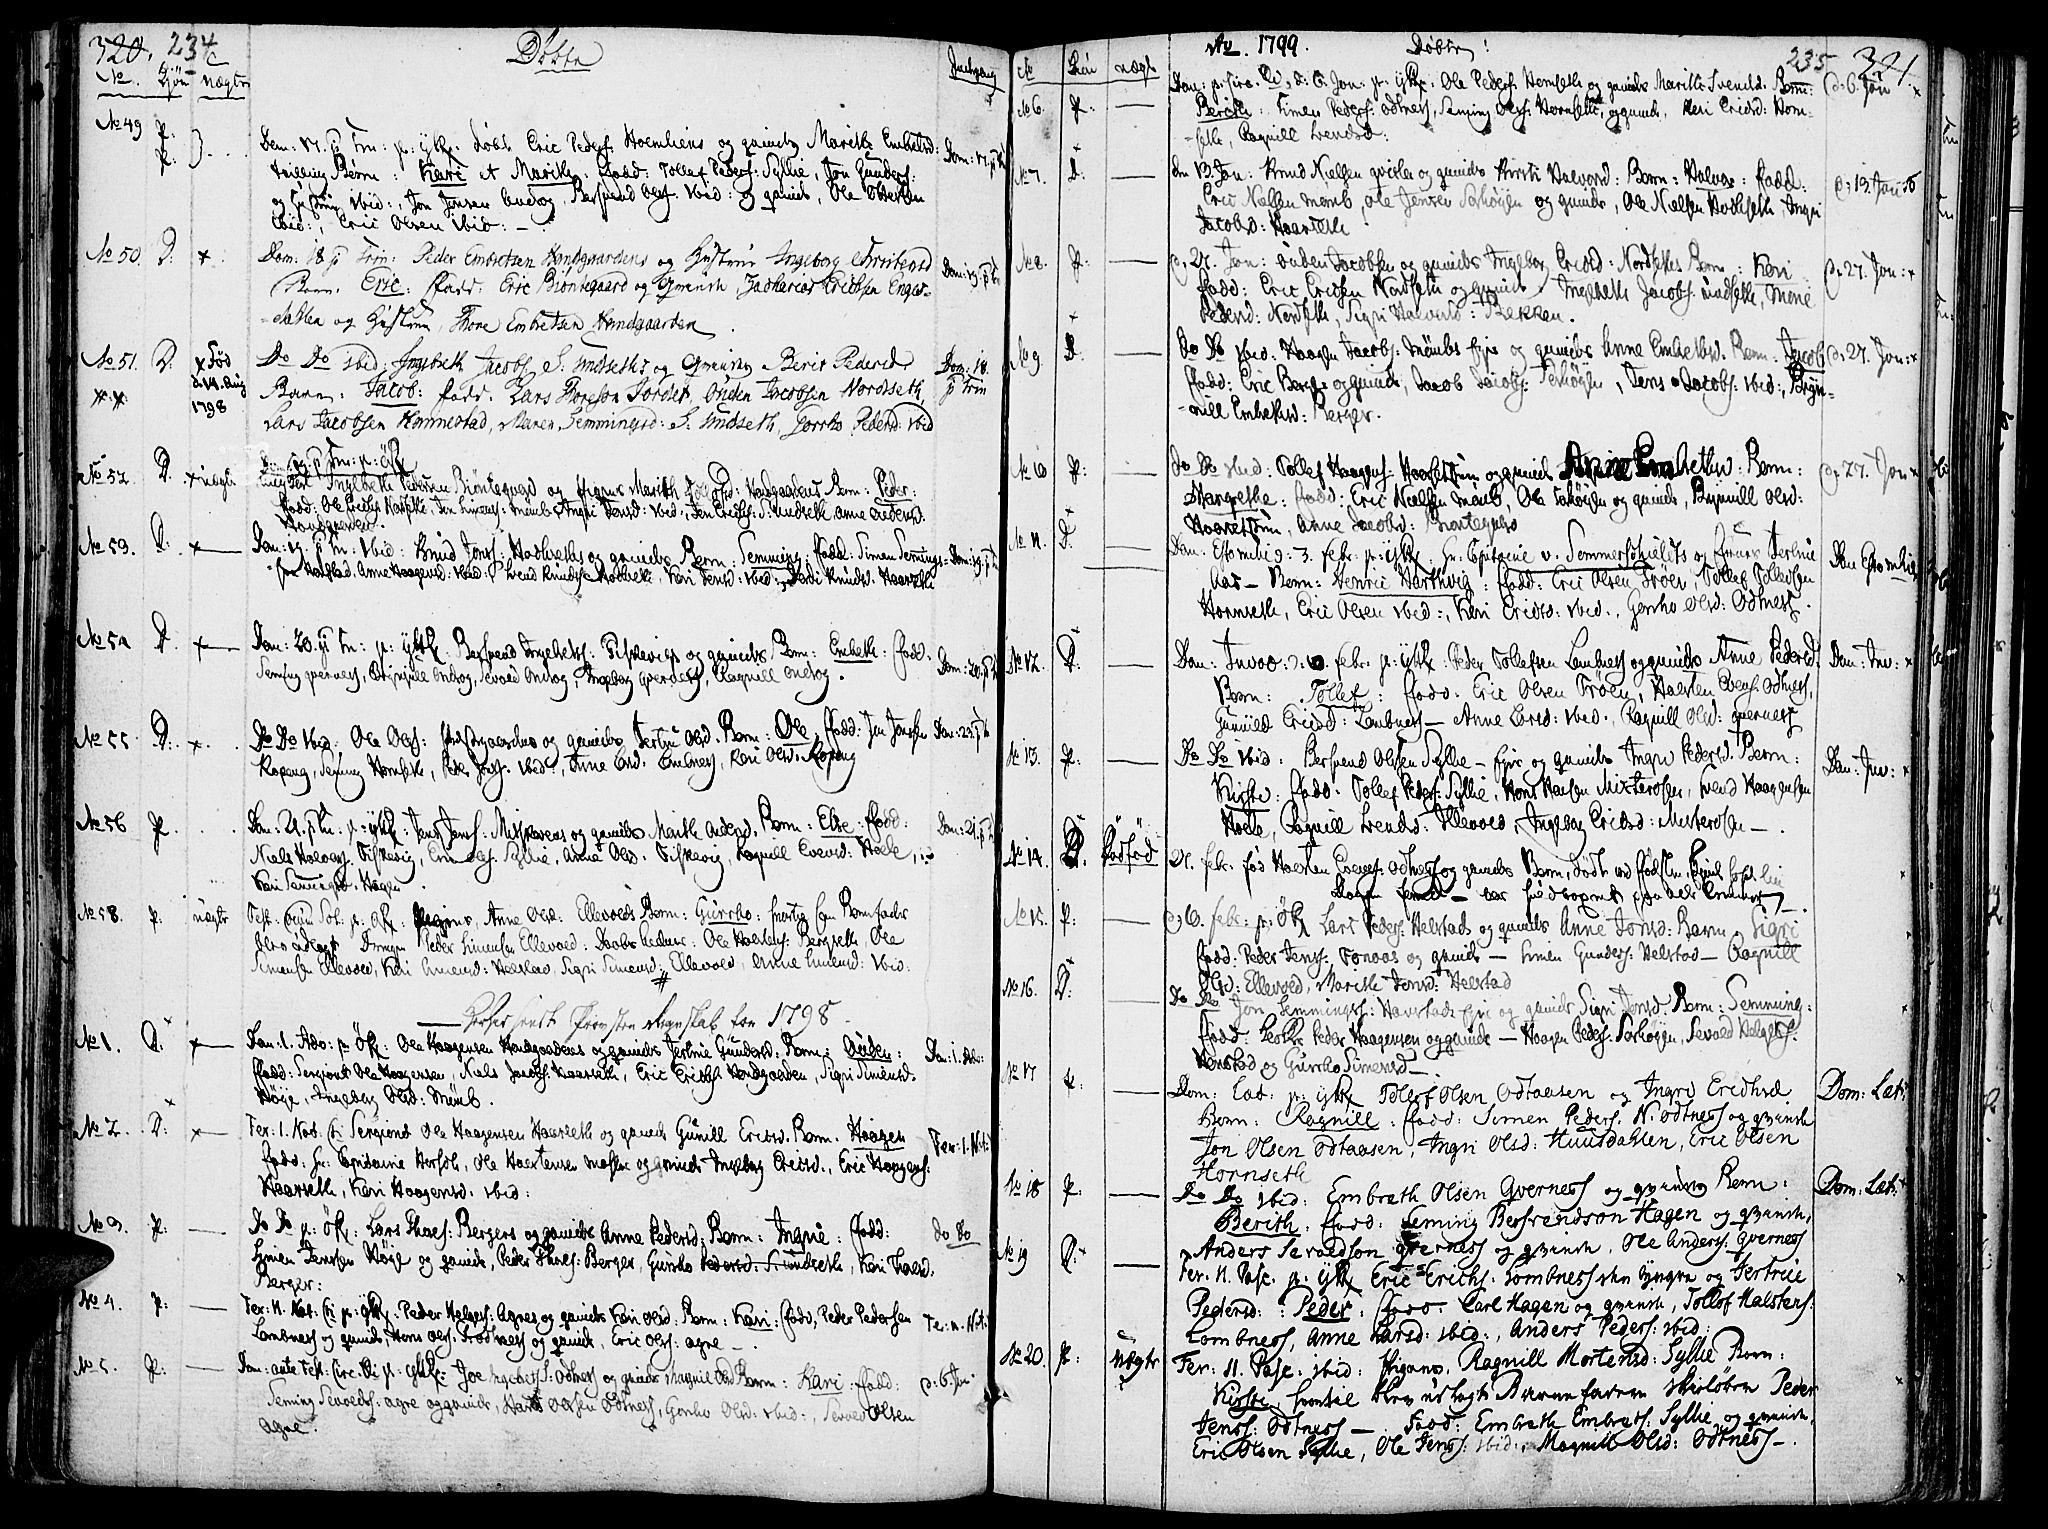 SAH, Rendalen prestekontor, H/Ha/Haa/L0002: Ministerialbok nr. 2, 1788-1814, s. 234-235